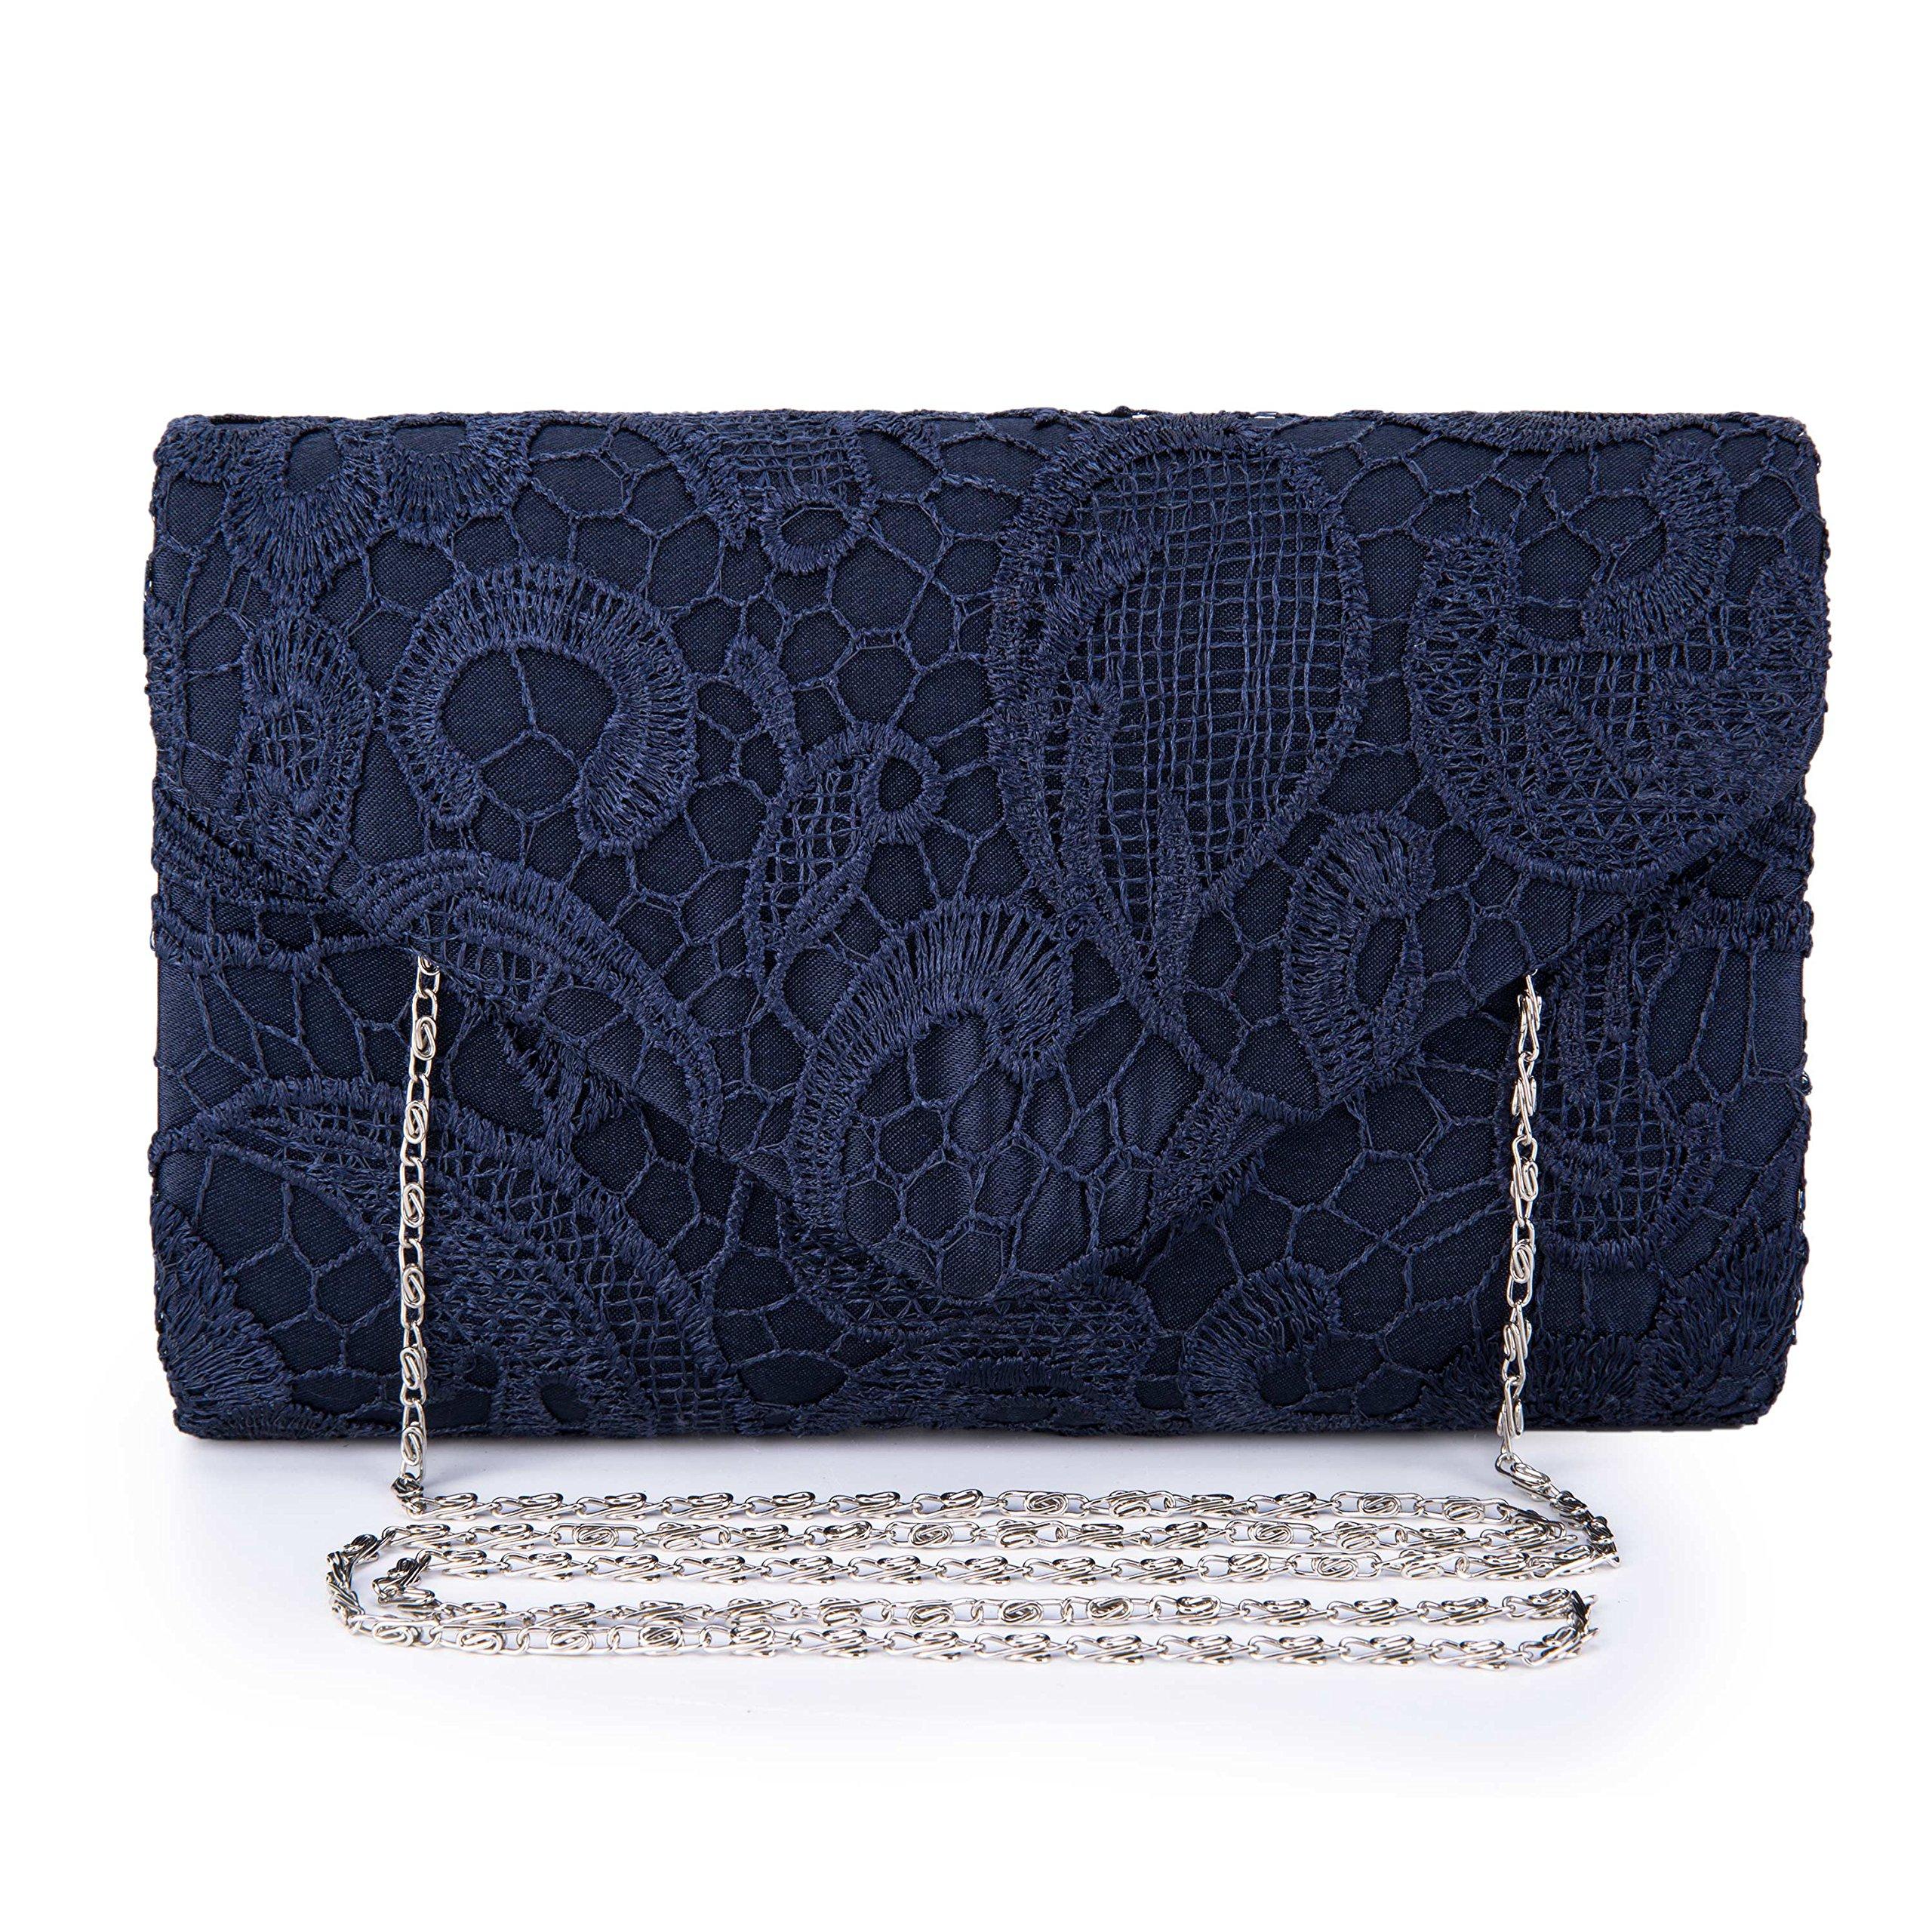 Chichitop Women's Elegant Floral Lace Envelope Clutch Evening Prom Handbag Purse, Navy Blue